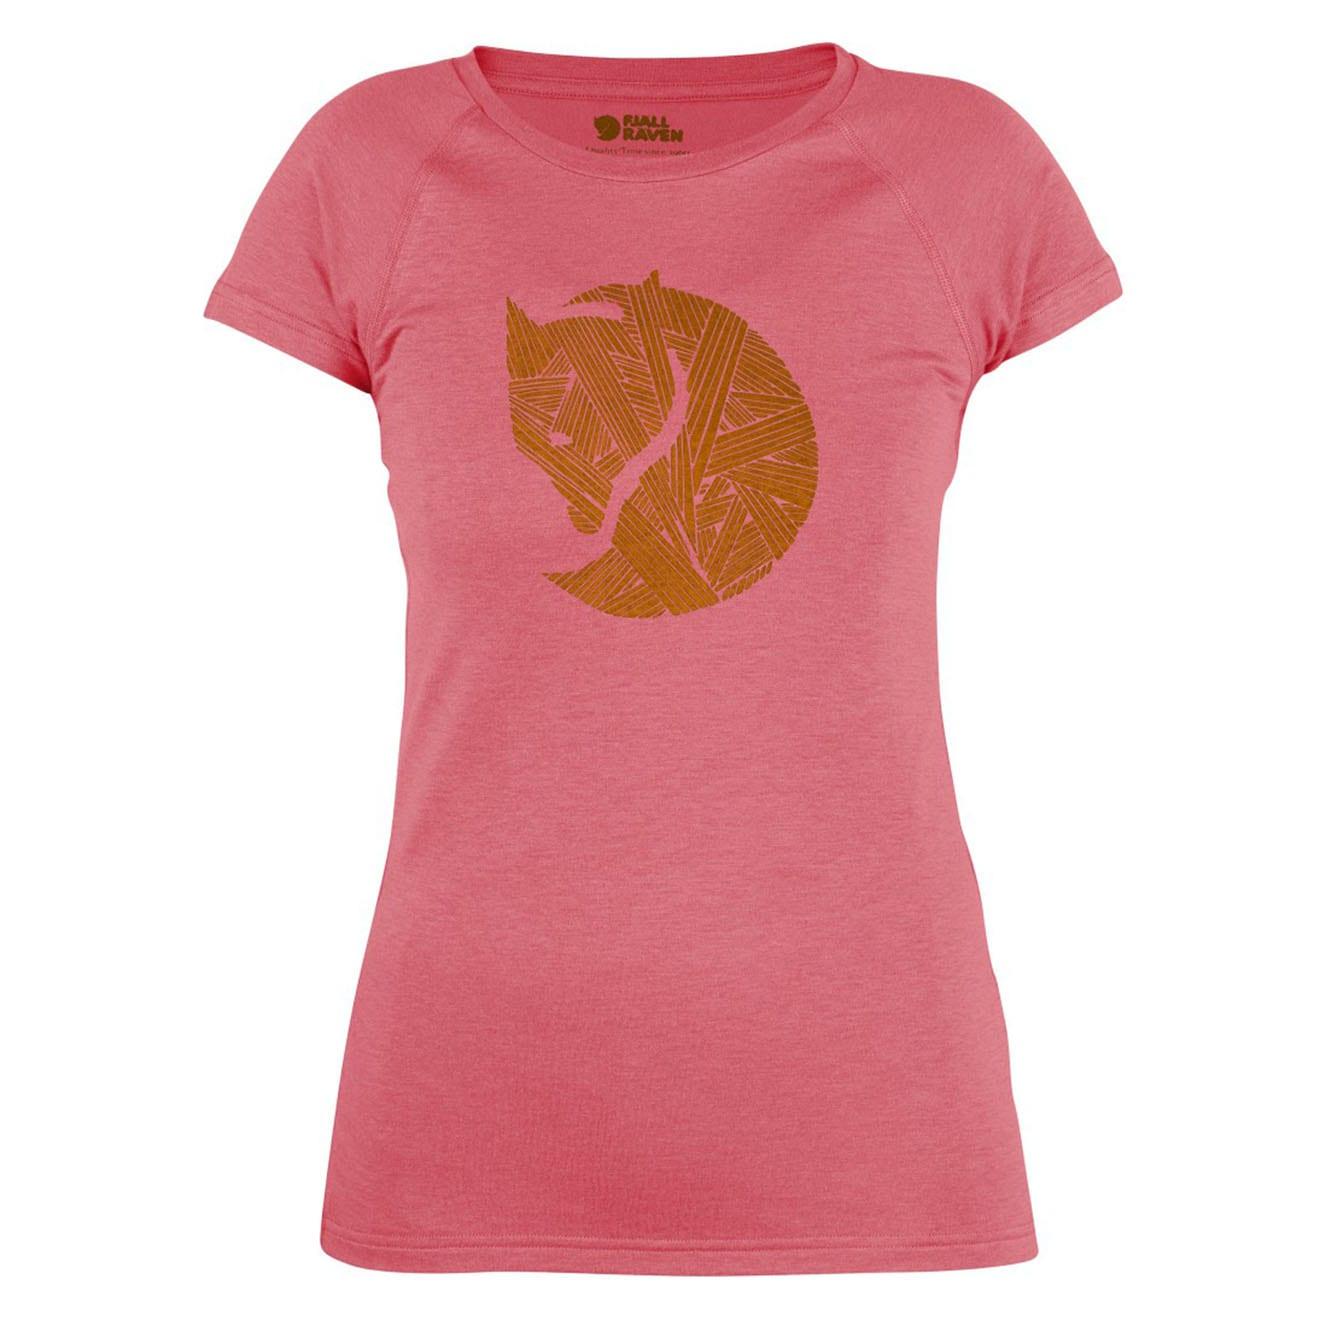 Fjallraven Womens Abisko Trail Print T-Shirt Peach Pink